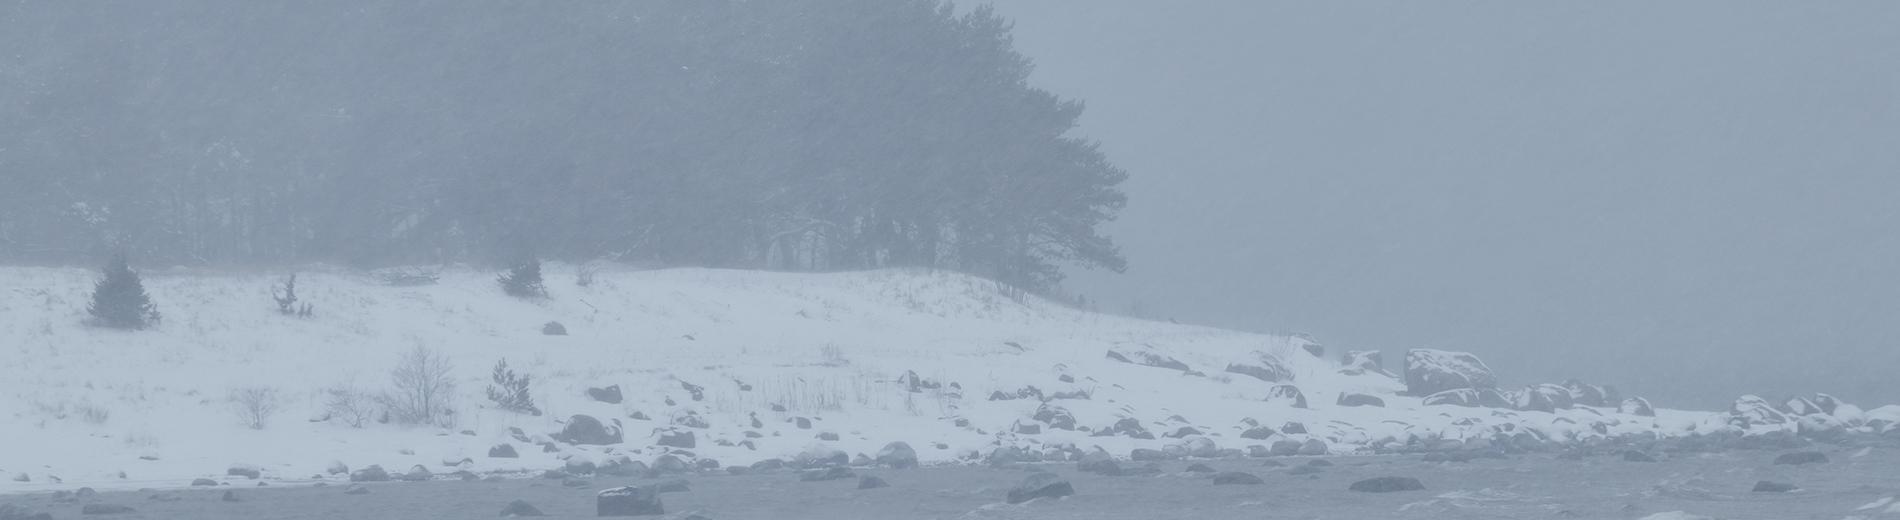 Türisalu cliff in snowstorm